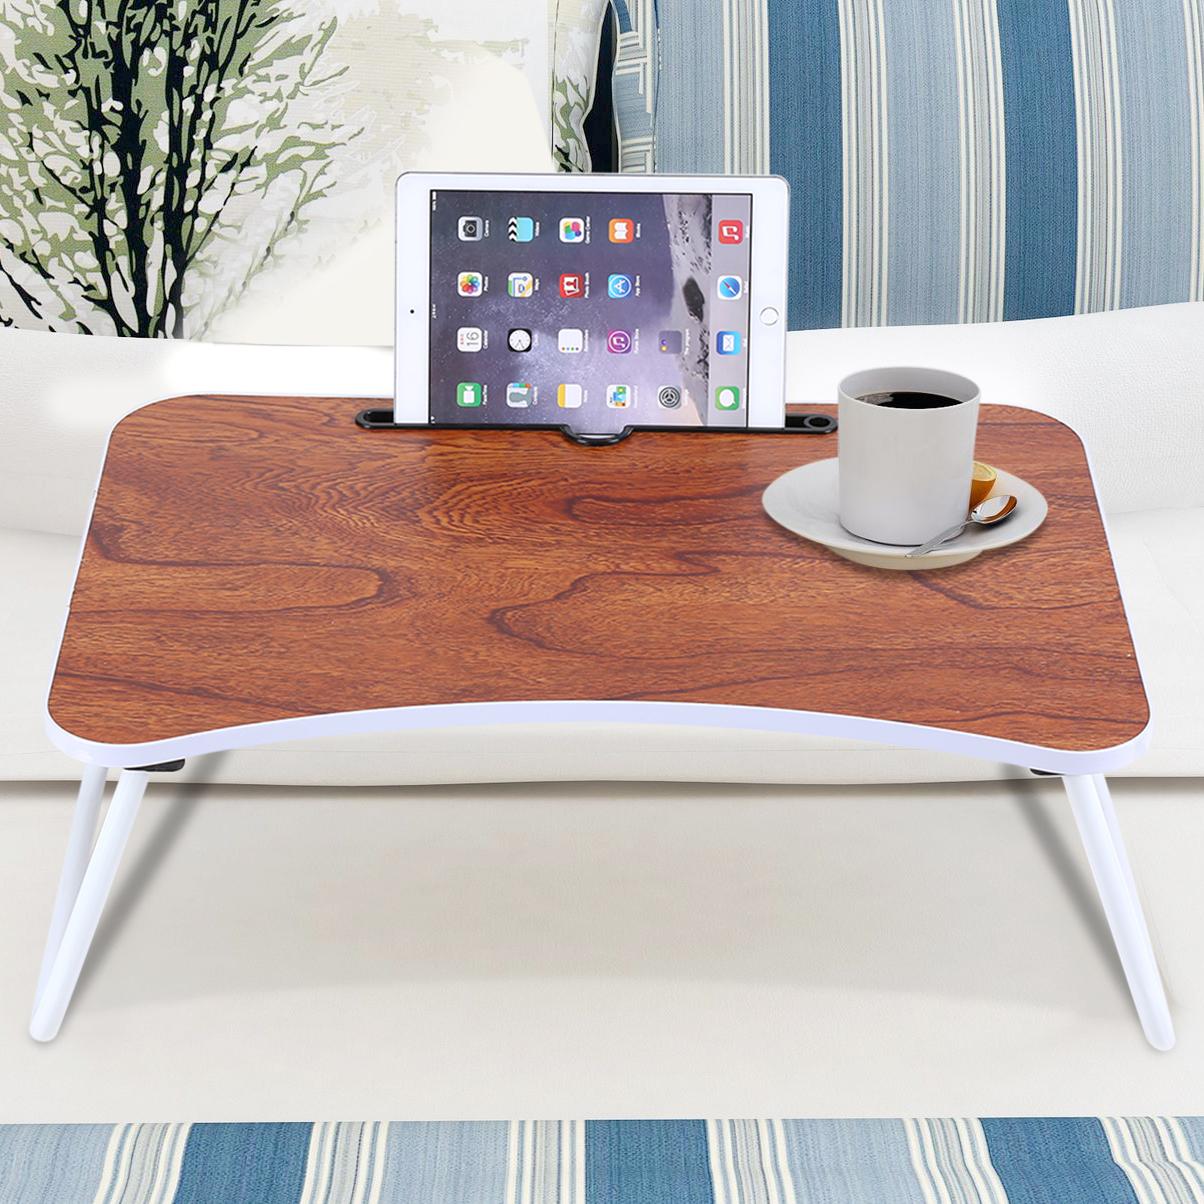 Yosoo Bed Lapto Table,Multi-purpose Folding Laptop Bed Desk Portable Standing Table Breakfast Tray,Bed Desk